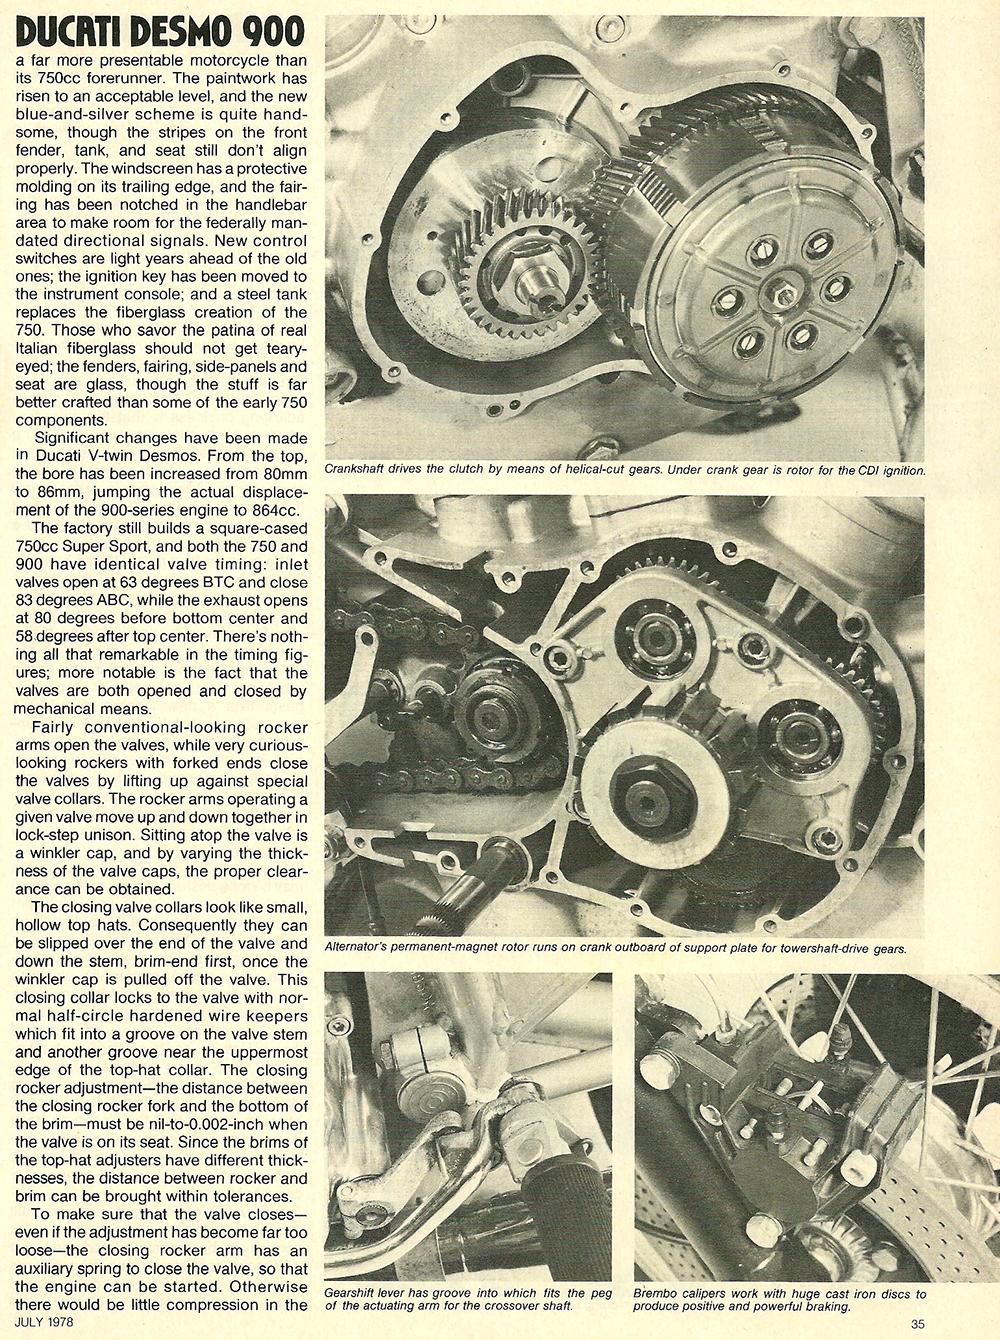 1978 Ducati Desmo 900 Super Sport road test 04.jpg